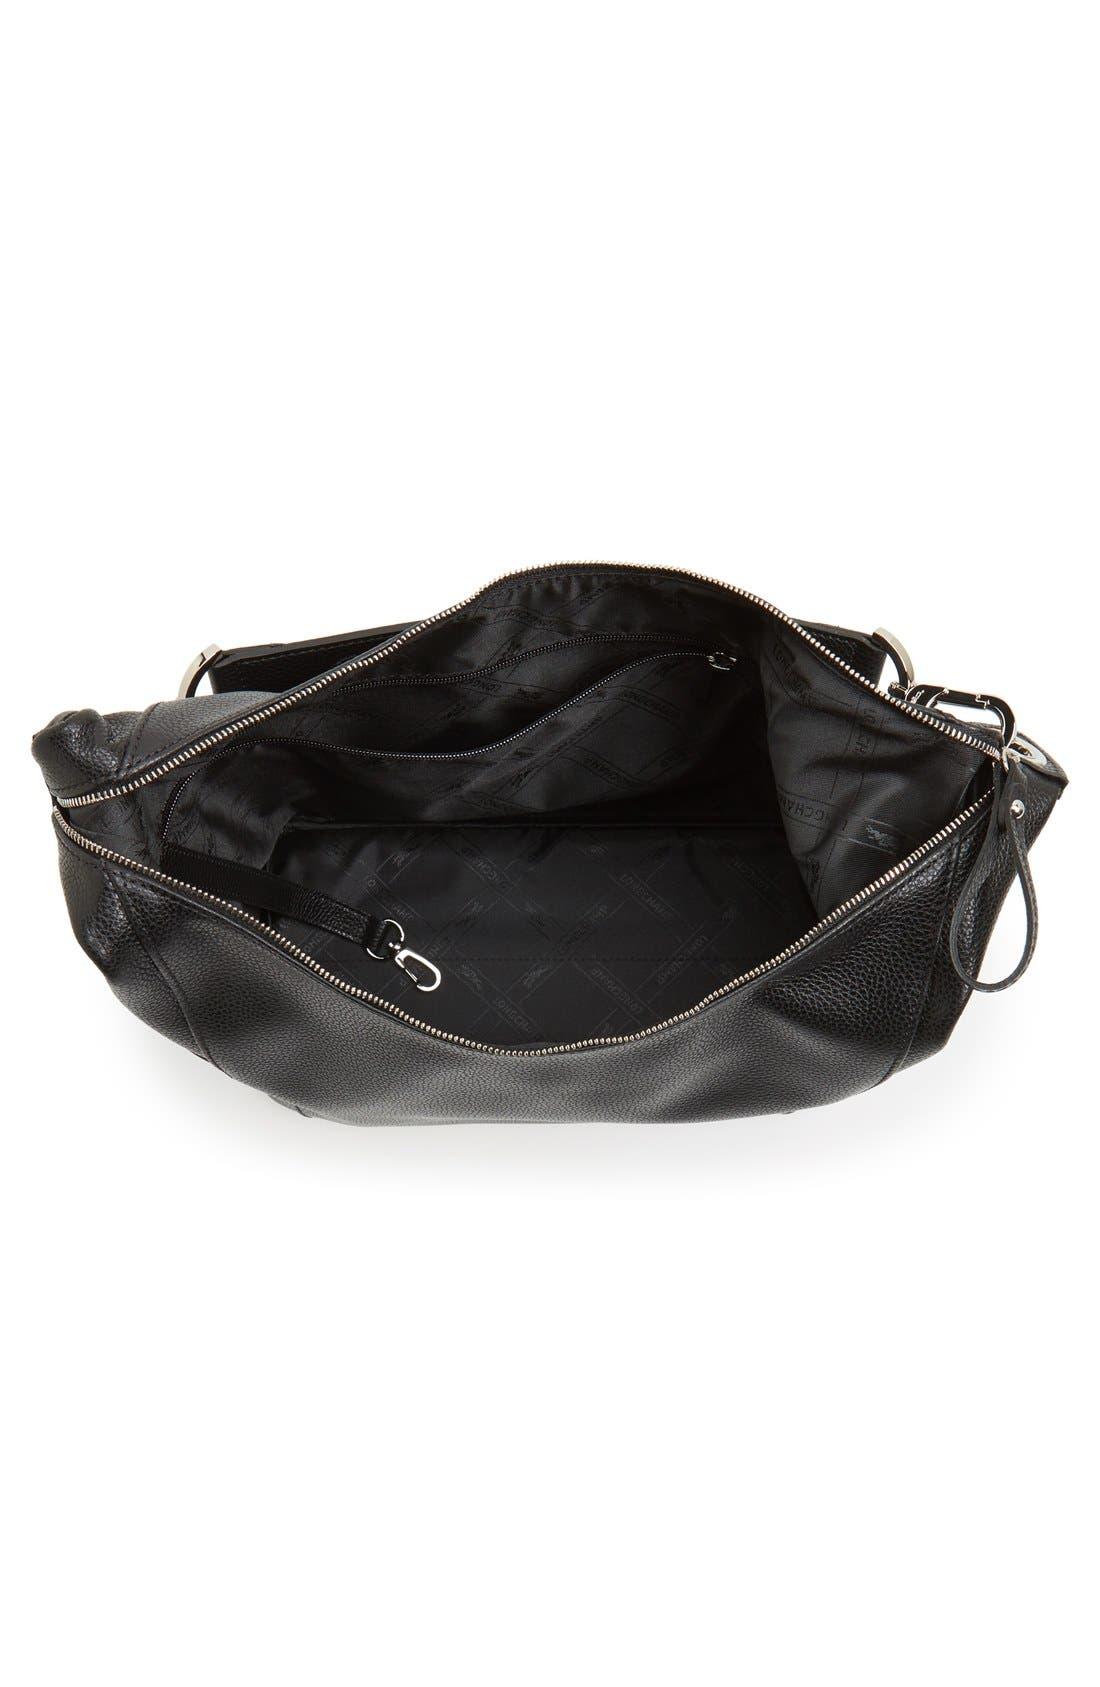 'Le Foulonne' Leather Hobo Bag,                             Alternate thumbnail 4, color,                             BLACK